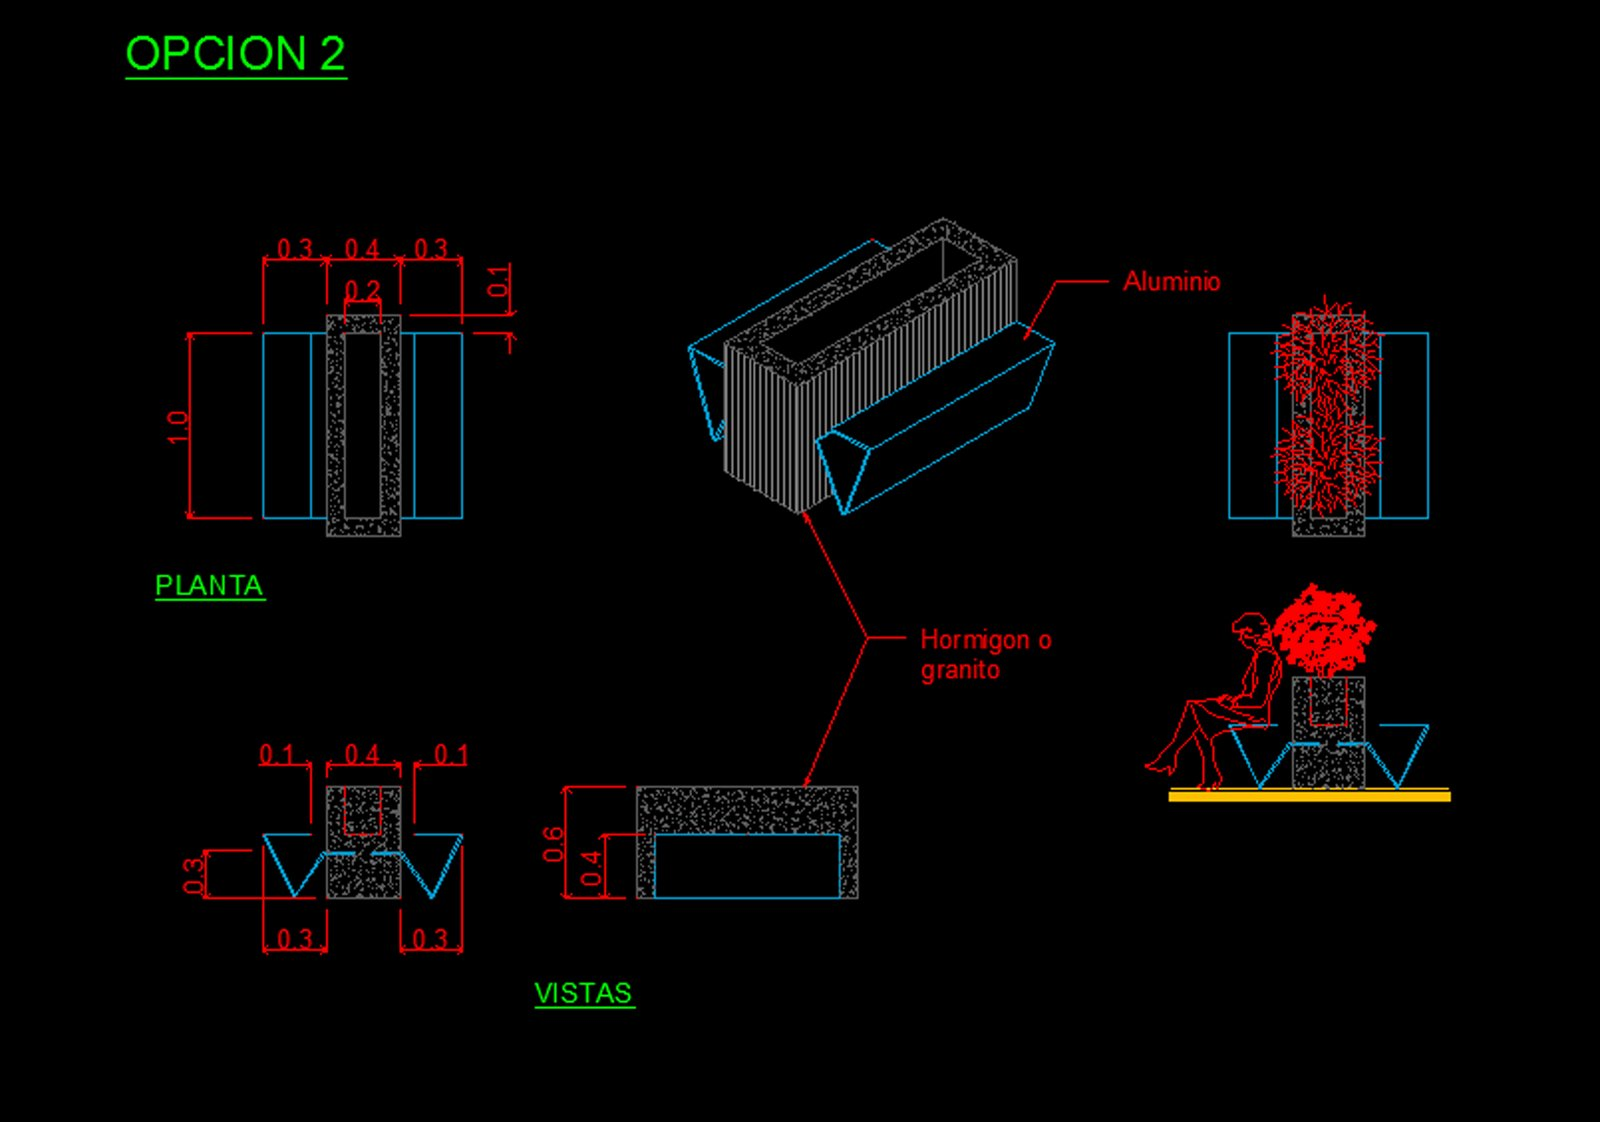 Gnv estudio arquitectura dise o de mobiliario urbano - Arquitectura de diseno ...